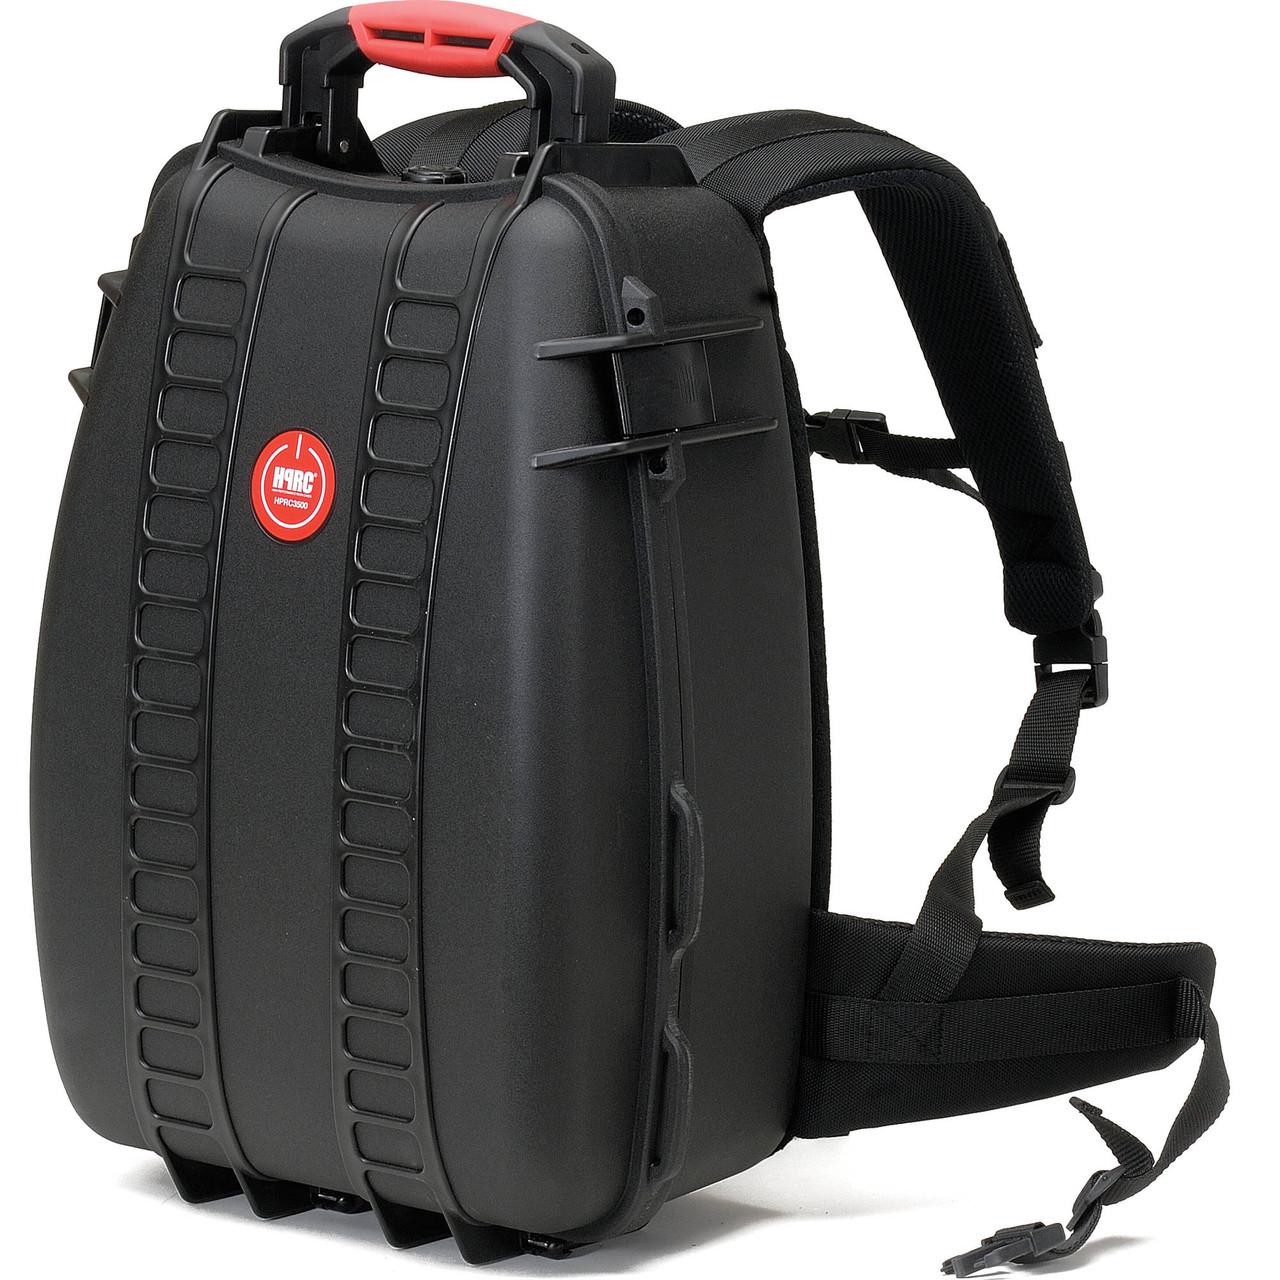 Рюкзак Backpack HPRC 3500DK  with Divider Kit (HPRC3500DK)